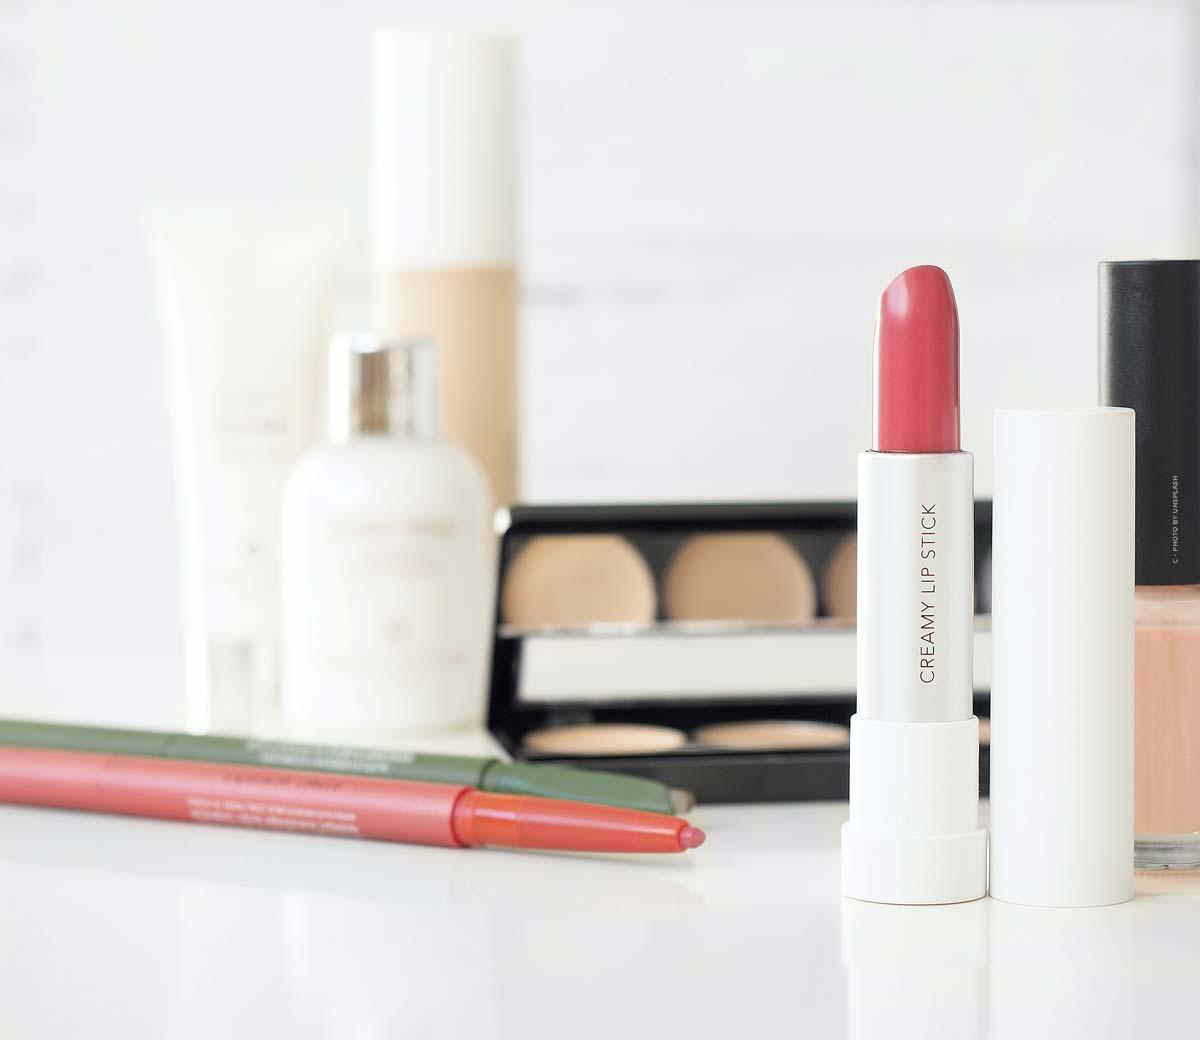 Tom Ford Beauty: Perfume y maquillaje del diseñador